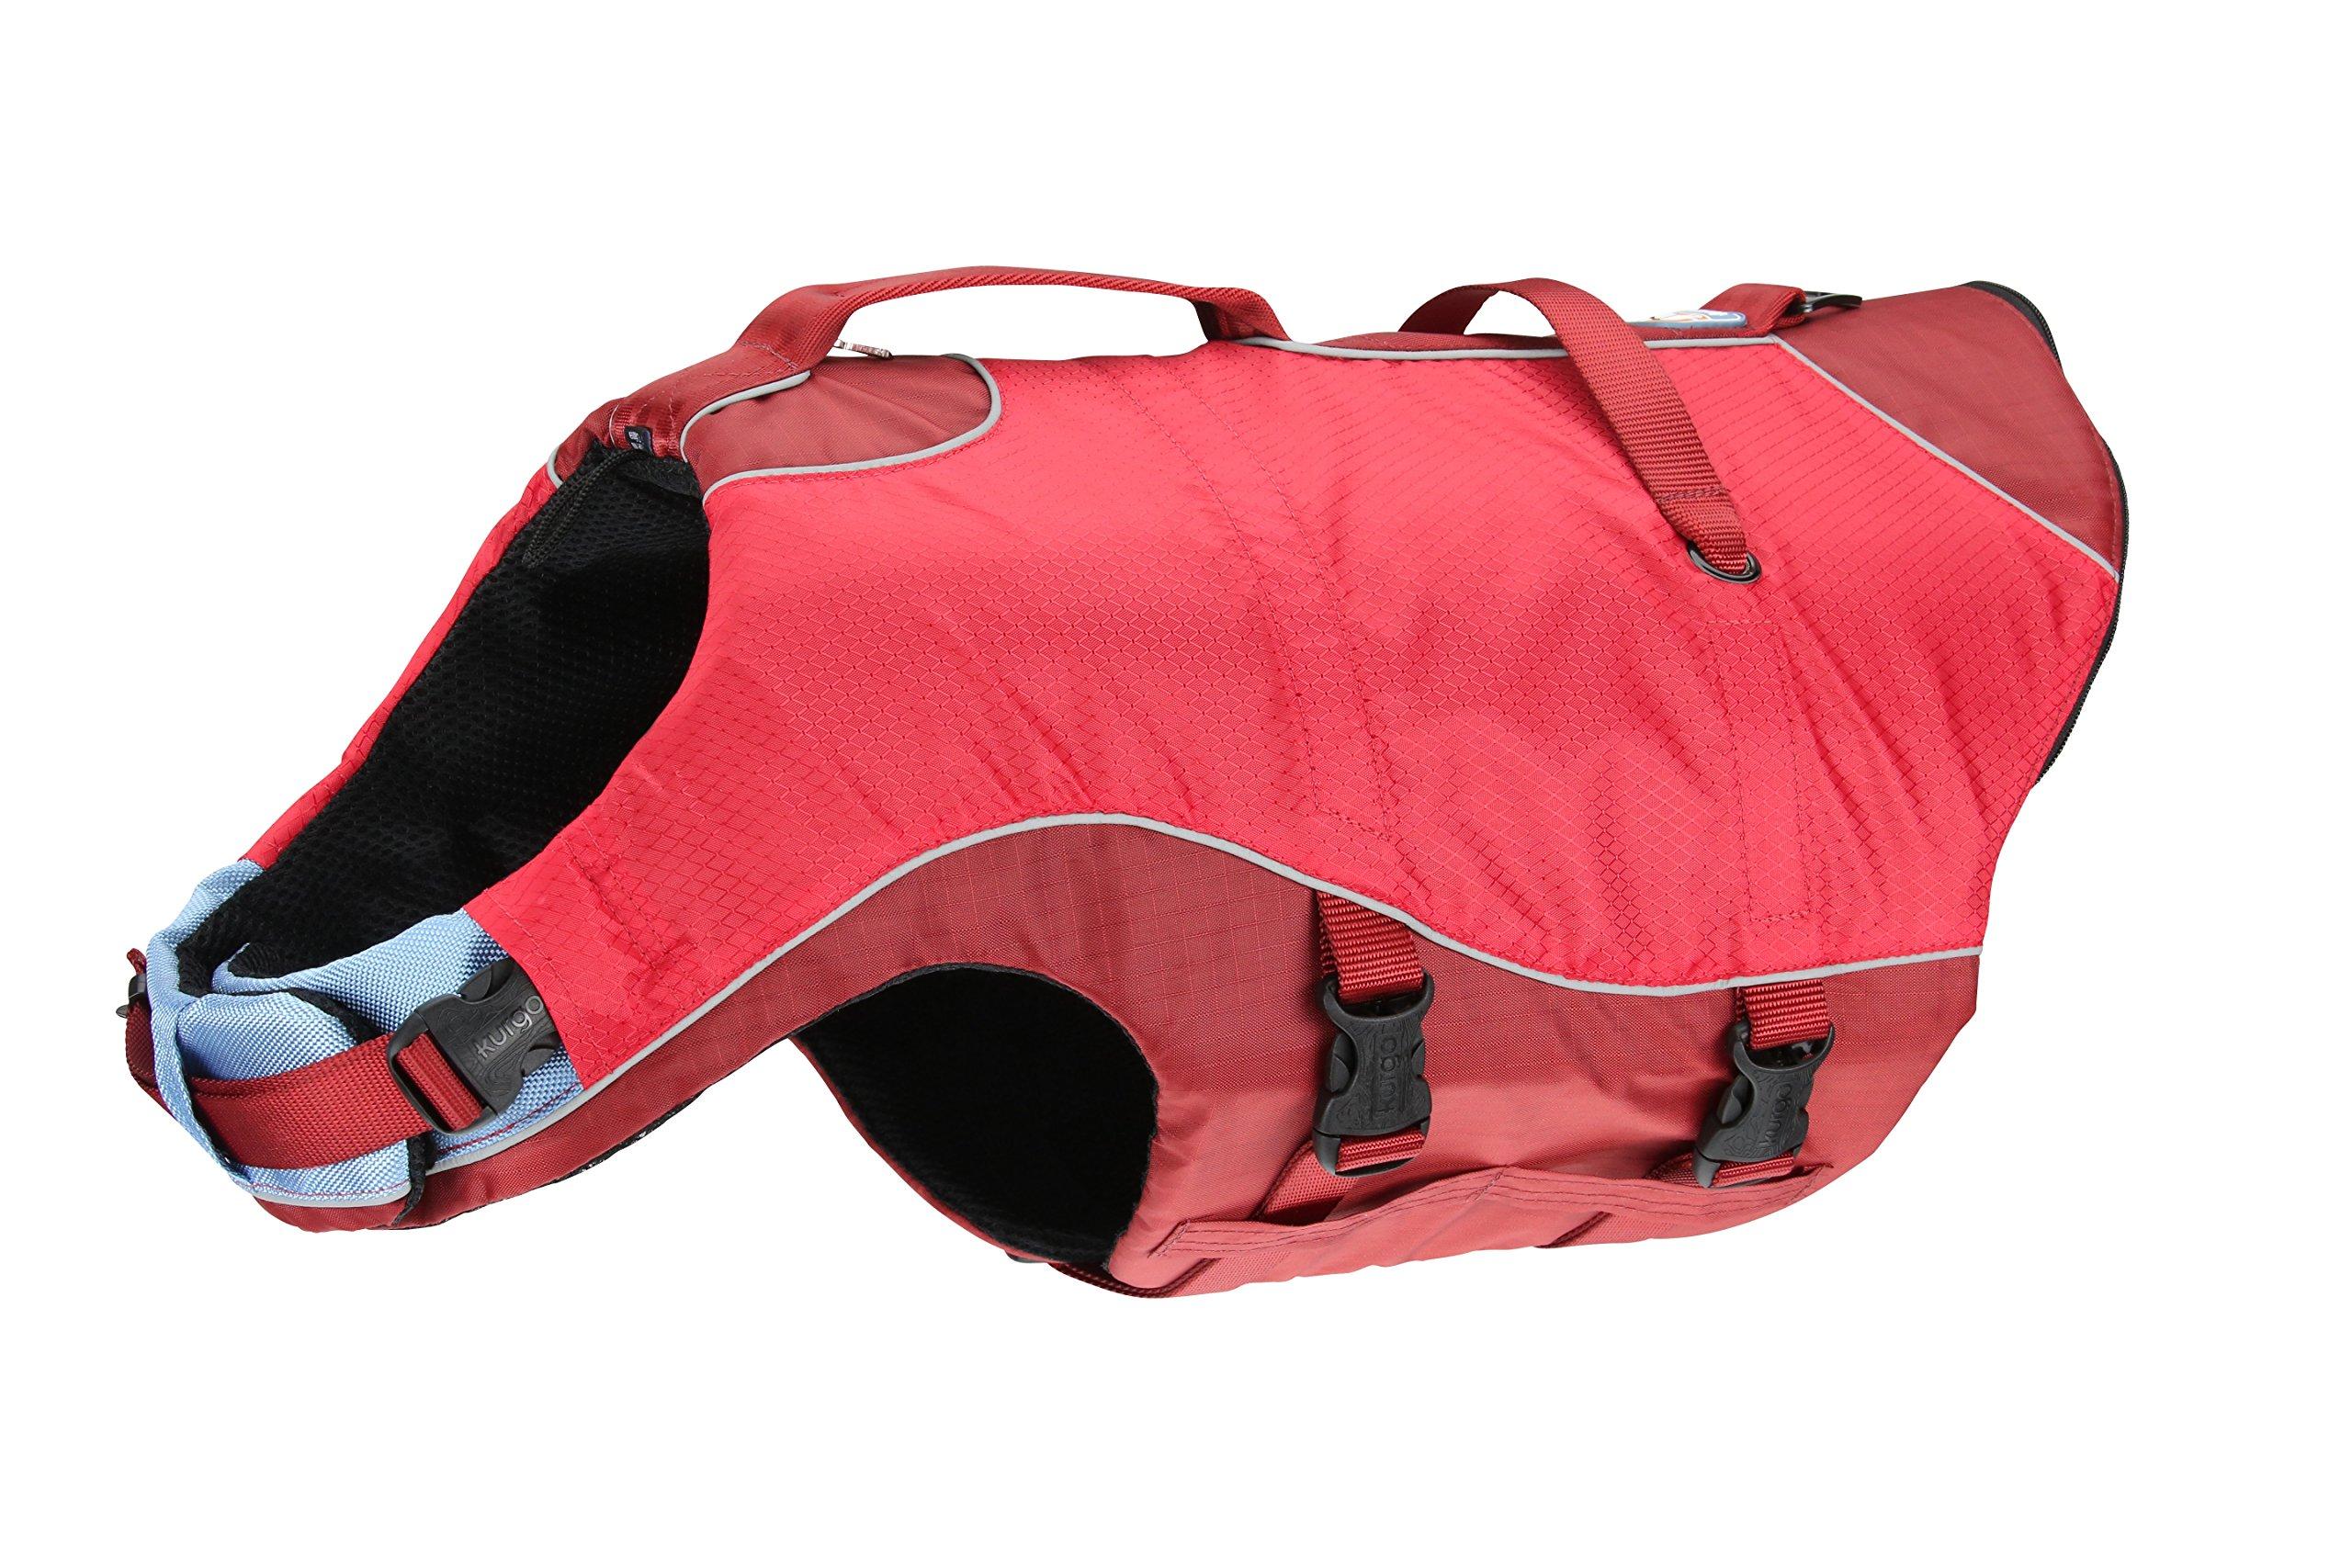 Kurgo Surf N Turf Dog Life Jacket - Adjustable with Reflective Trim, Small, Red